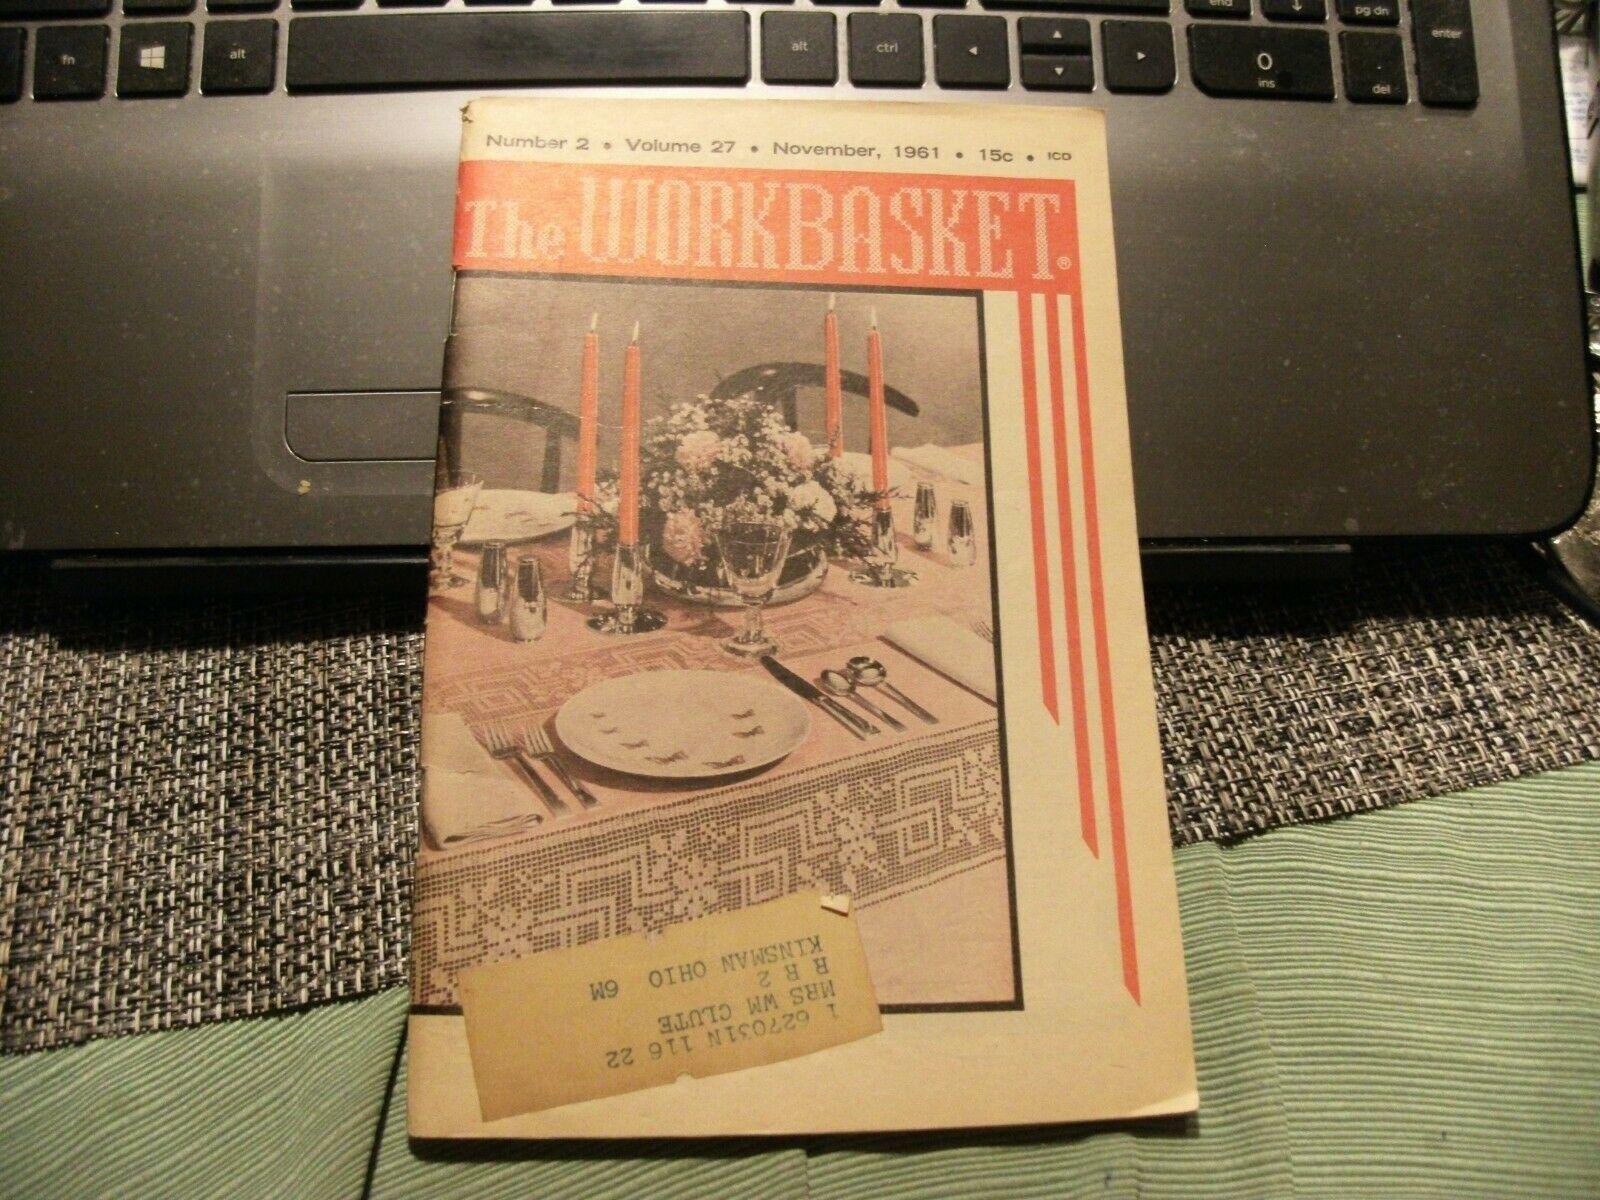 3# Vintage The Workbasket Knit/Crochet and Craft Magazine November, 1961 - $5.93